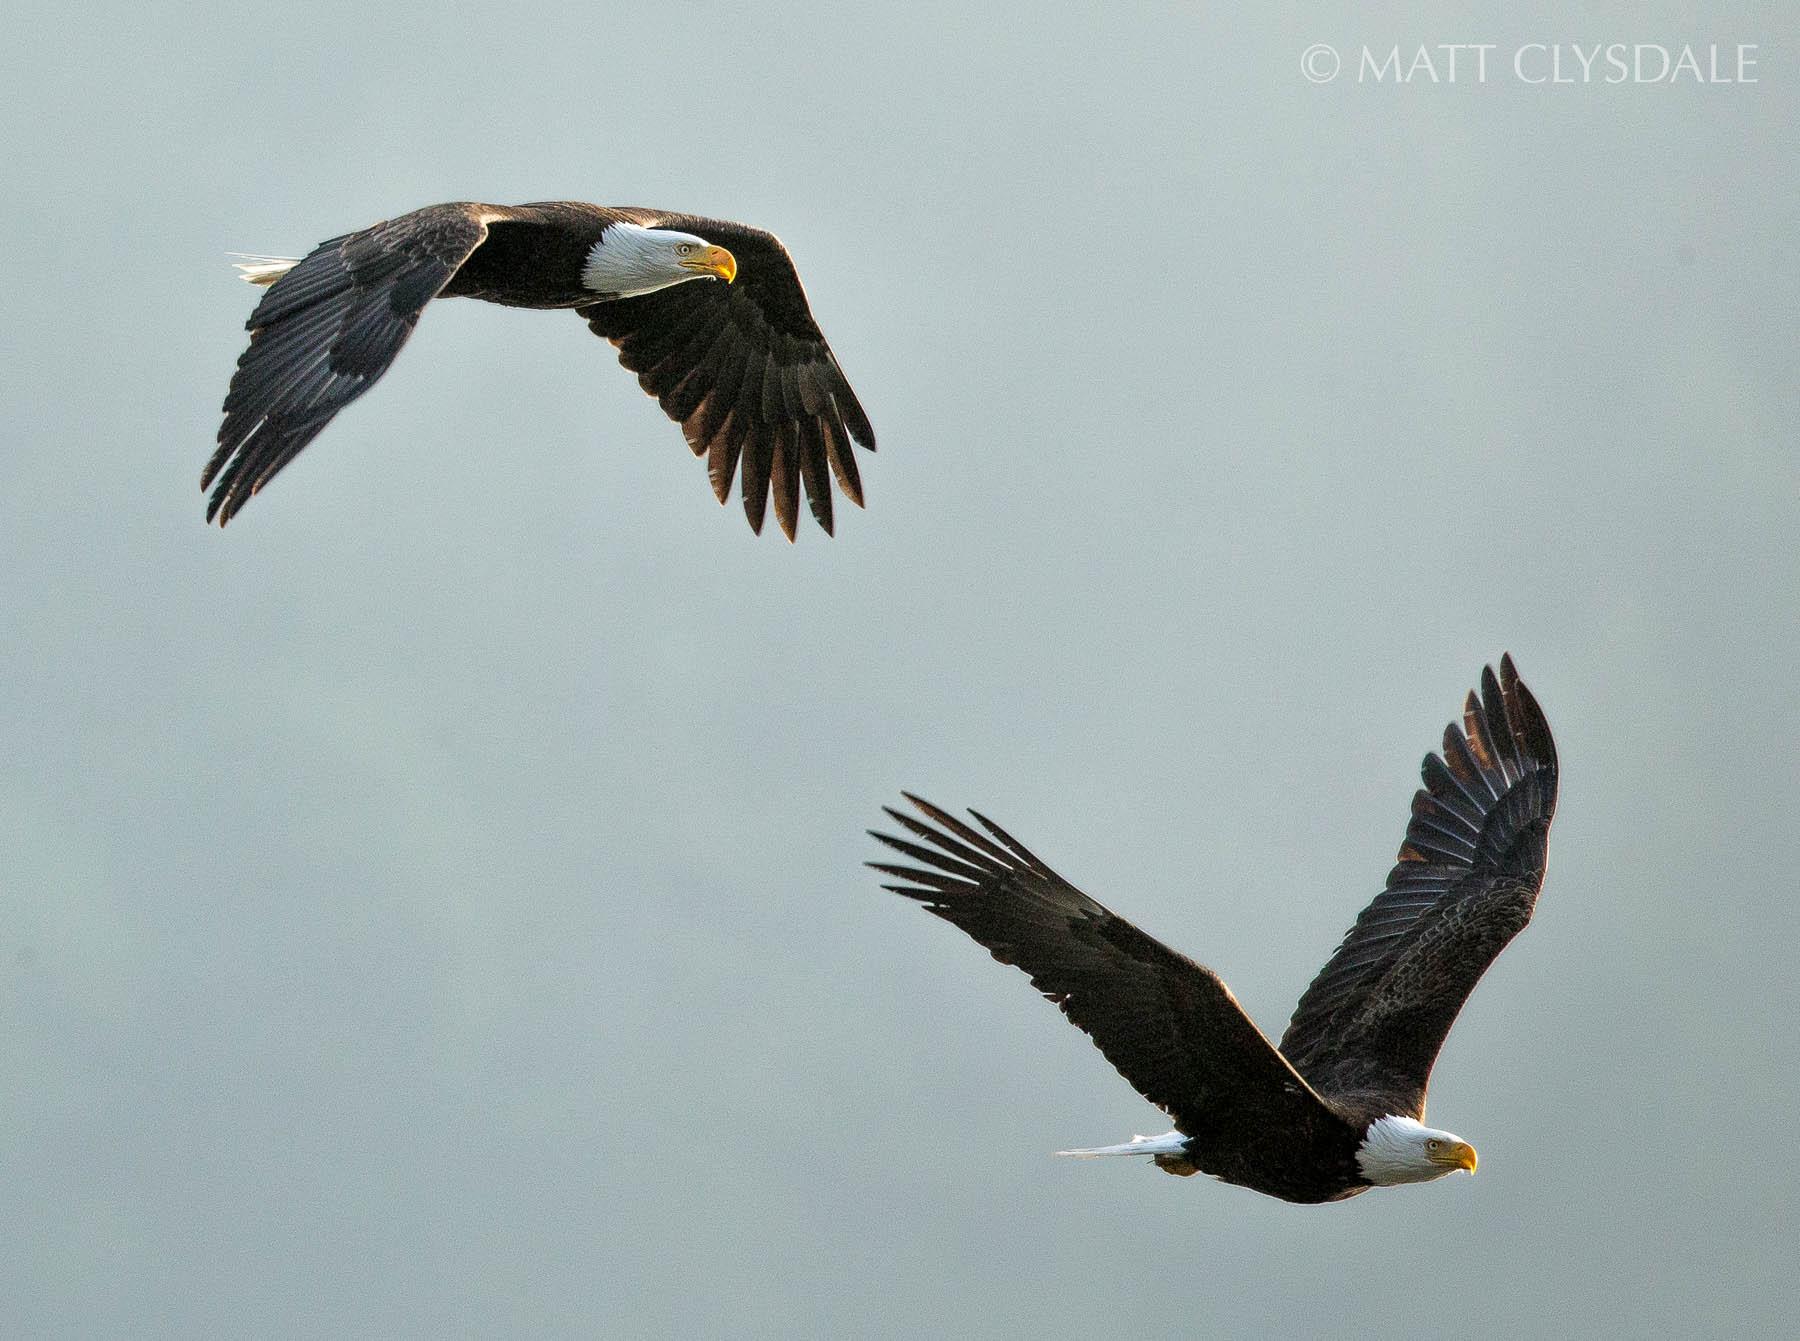 Crescent Bay Eagle Pair